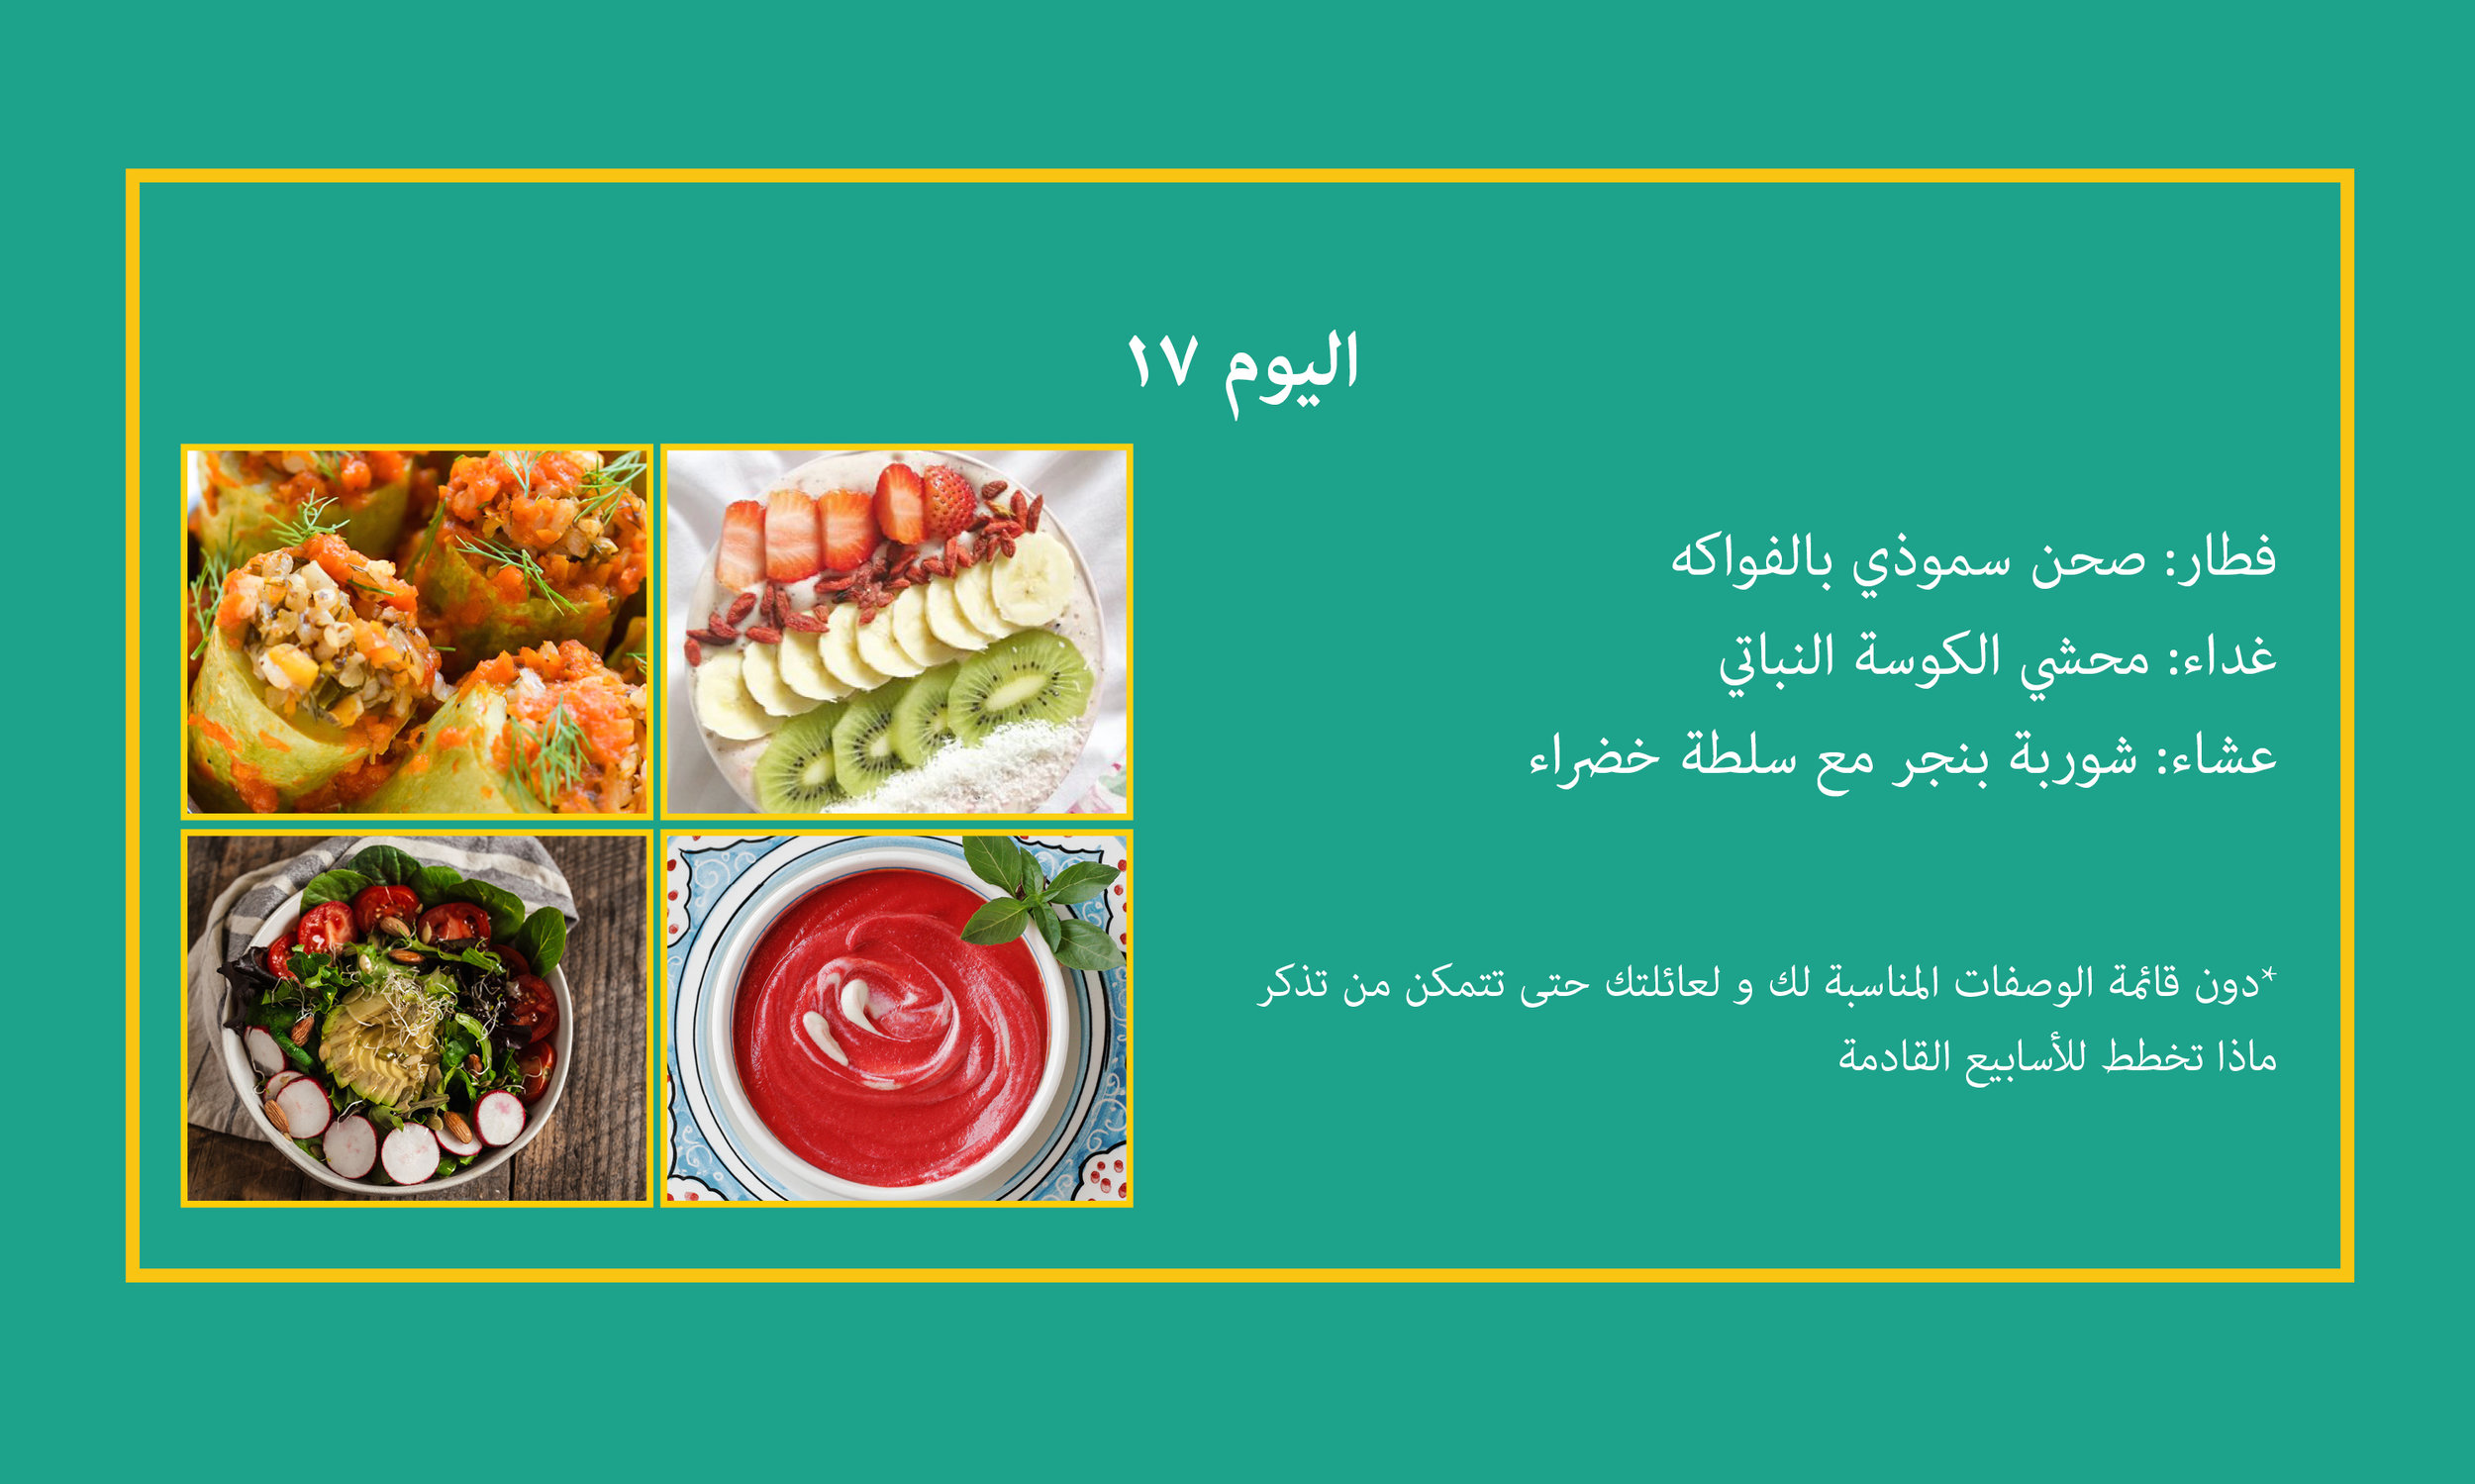 Day 17 Arabic.jpg